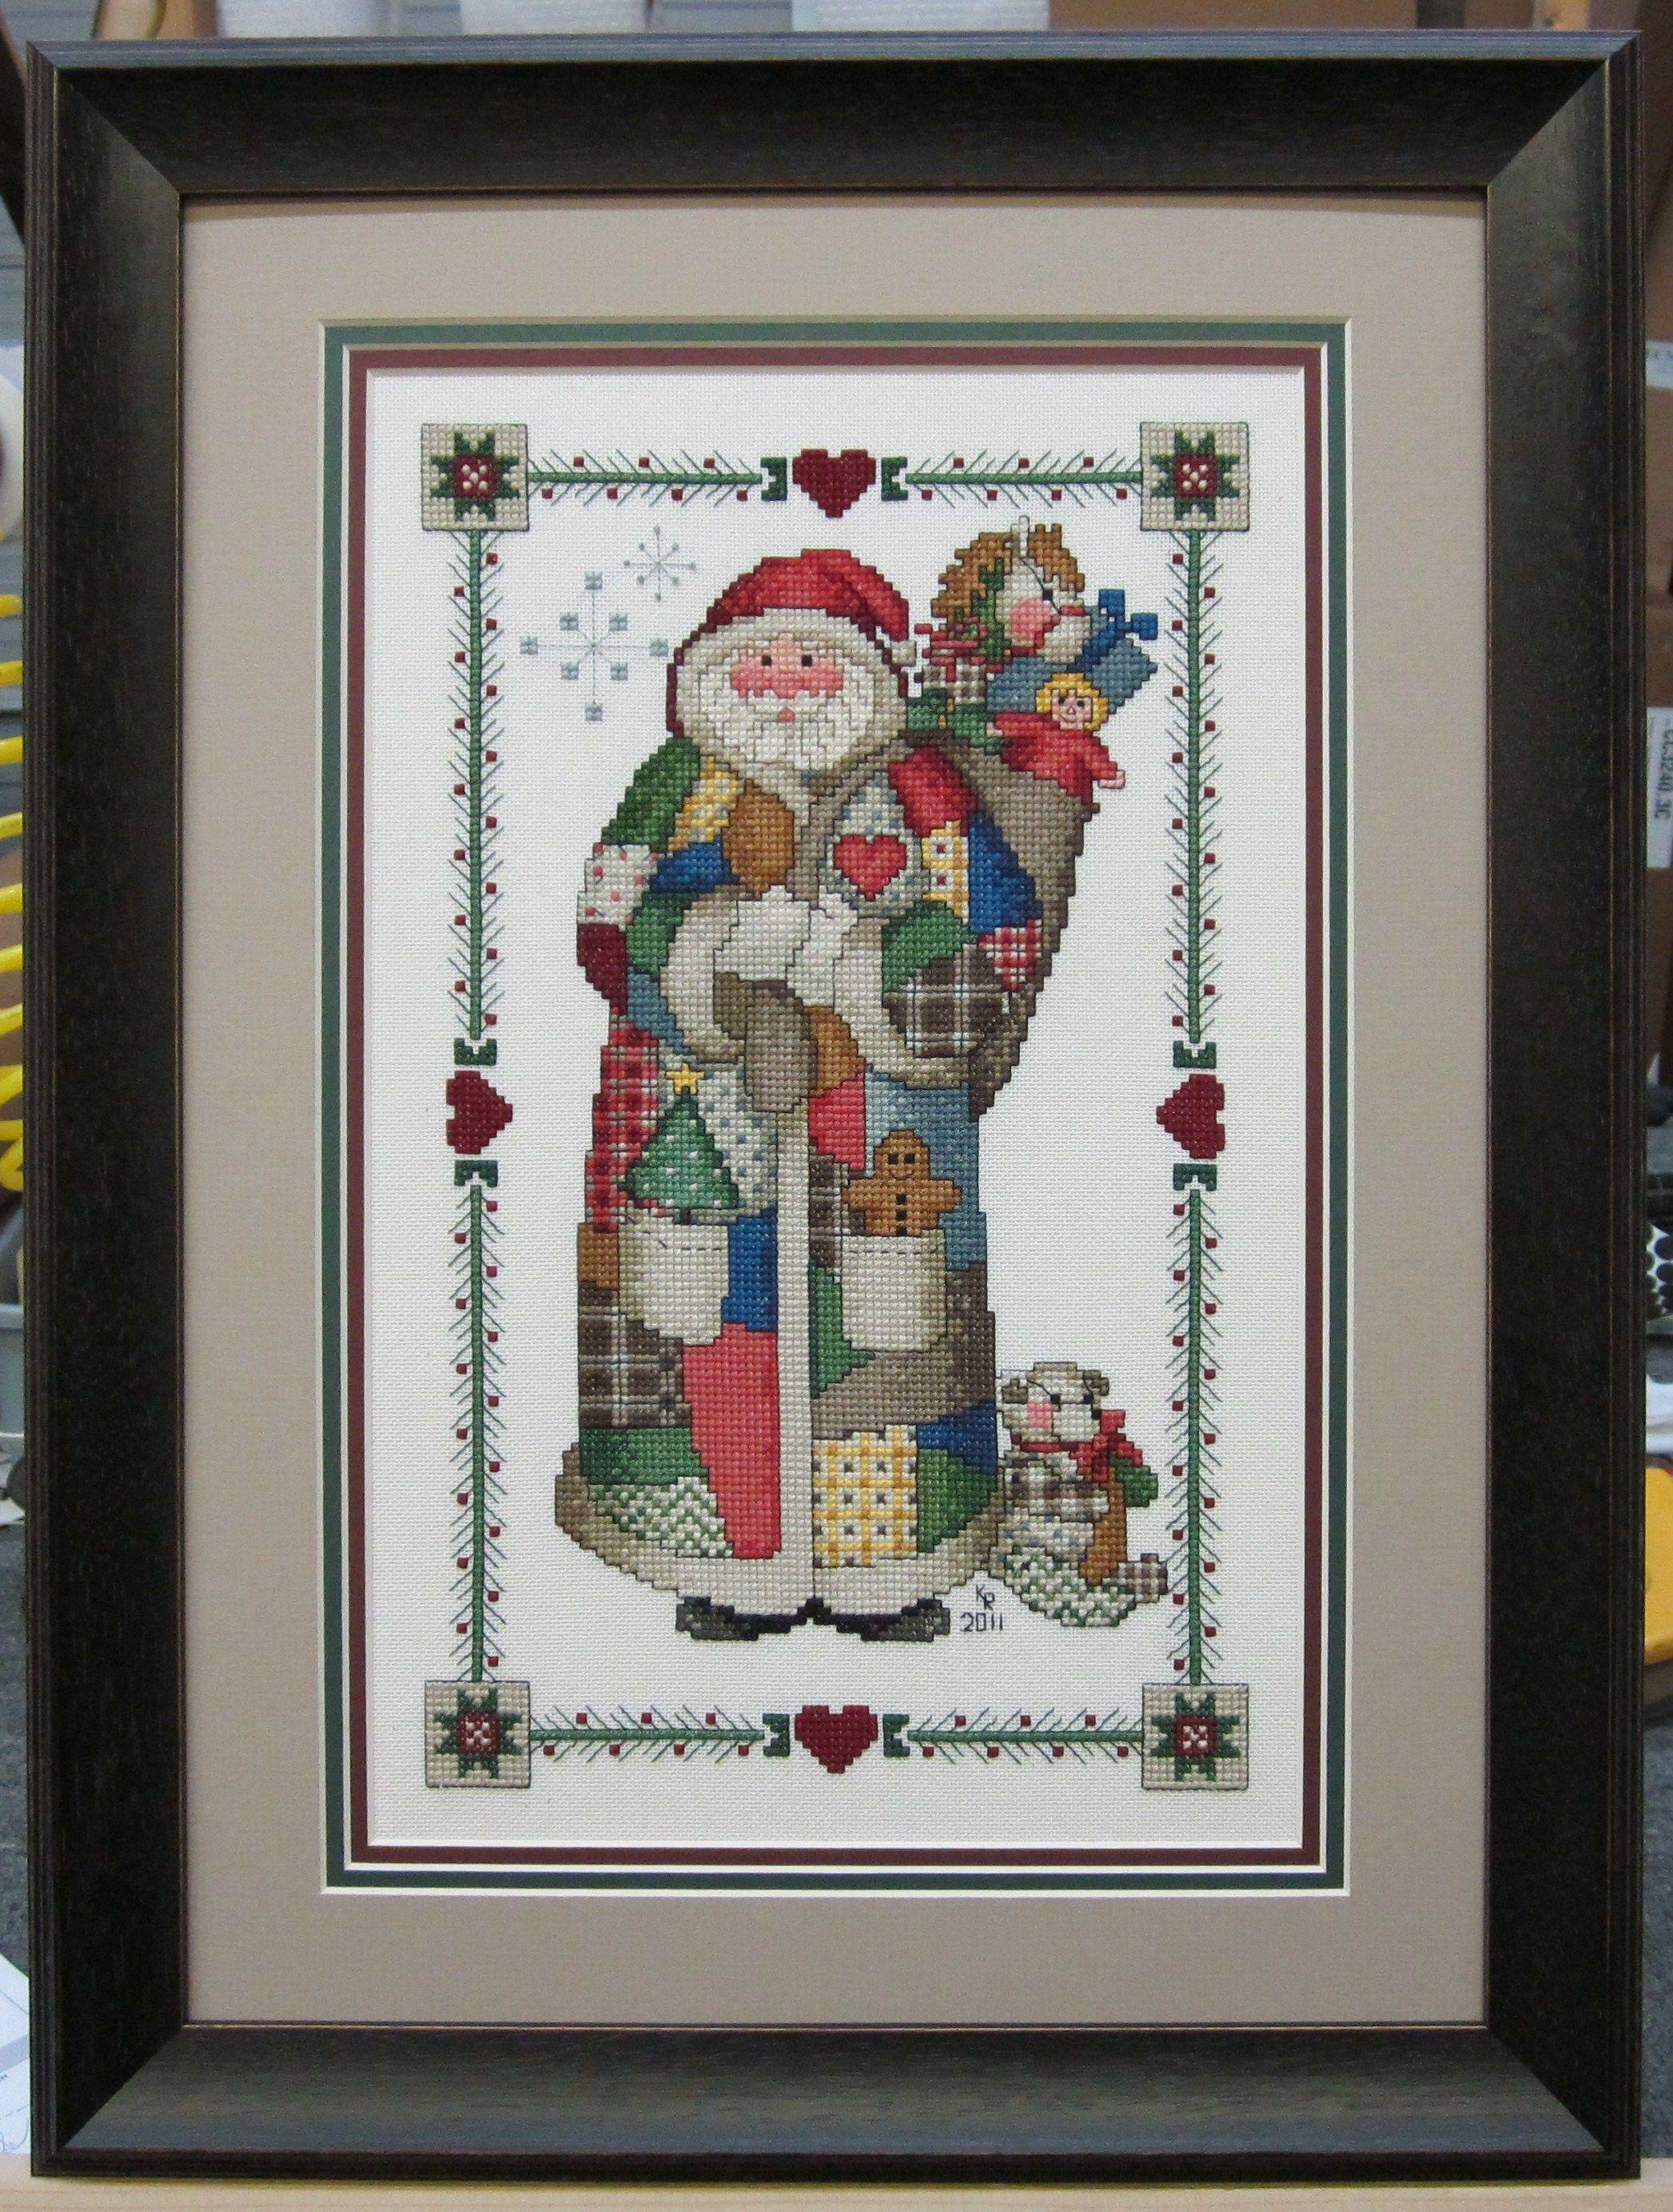 Cross stitch with triple mat and Larson-Juhl frame. Beautifully ...